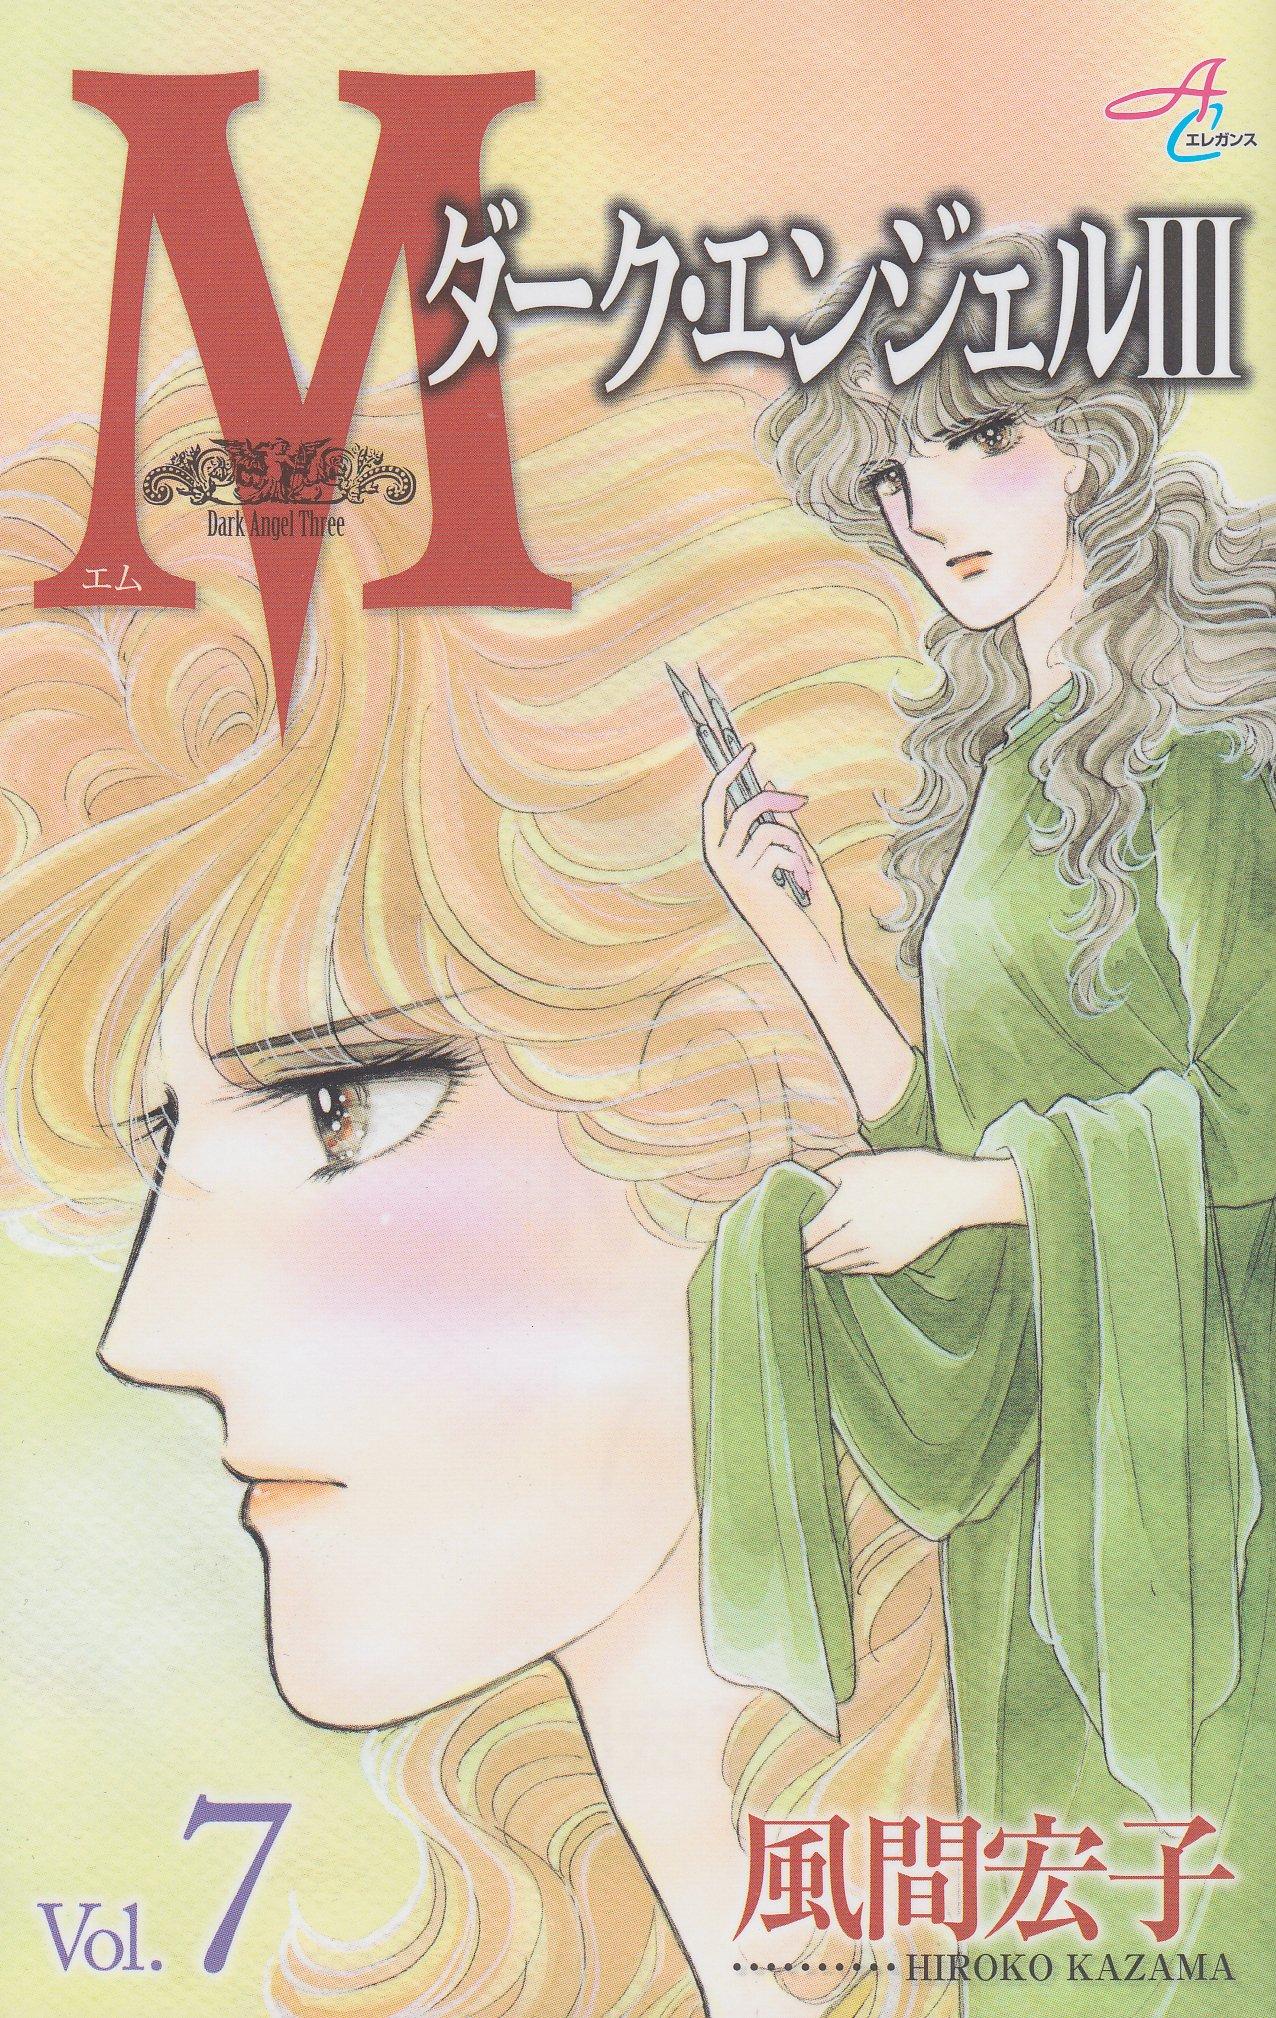 Download M - Dark Angel III - Vol.7 (Akita Comics Elegance) Manga pdf epub